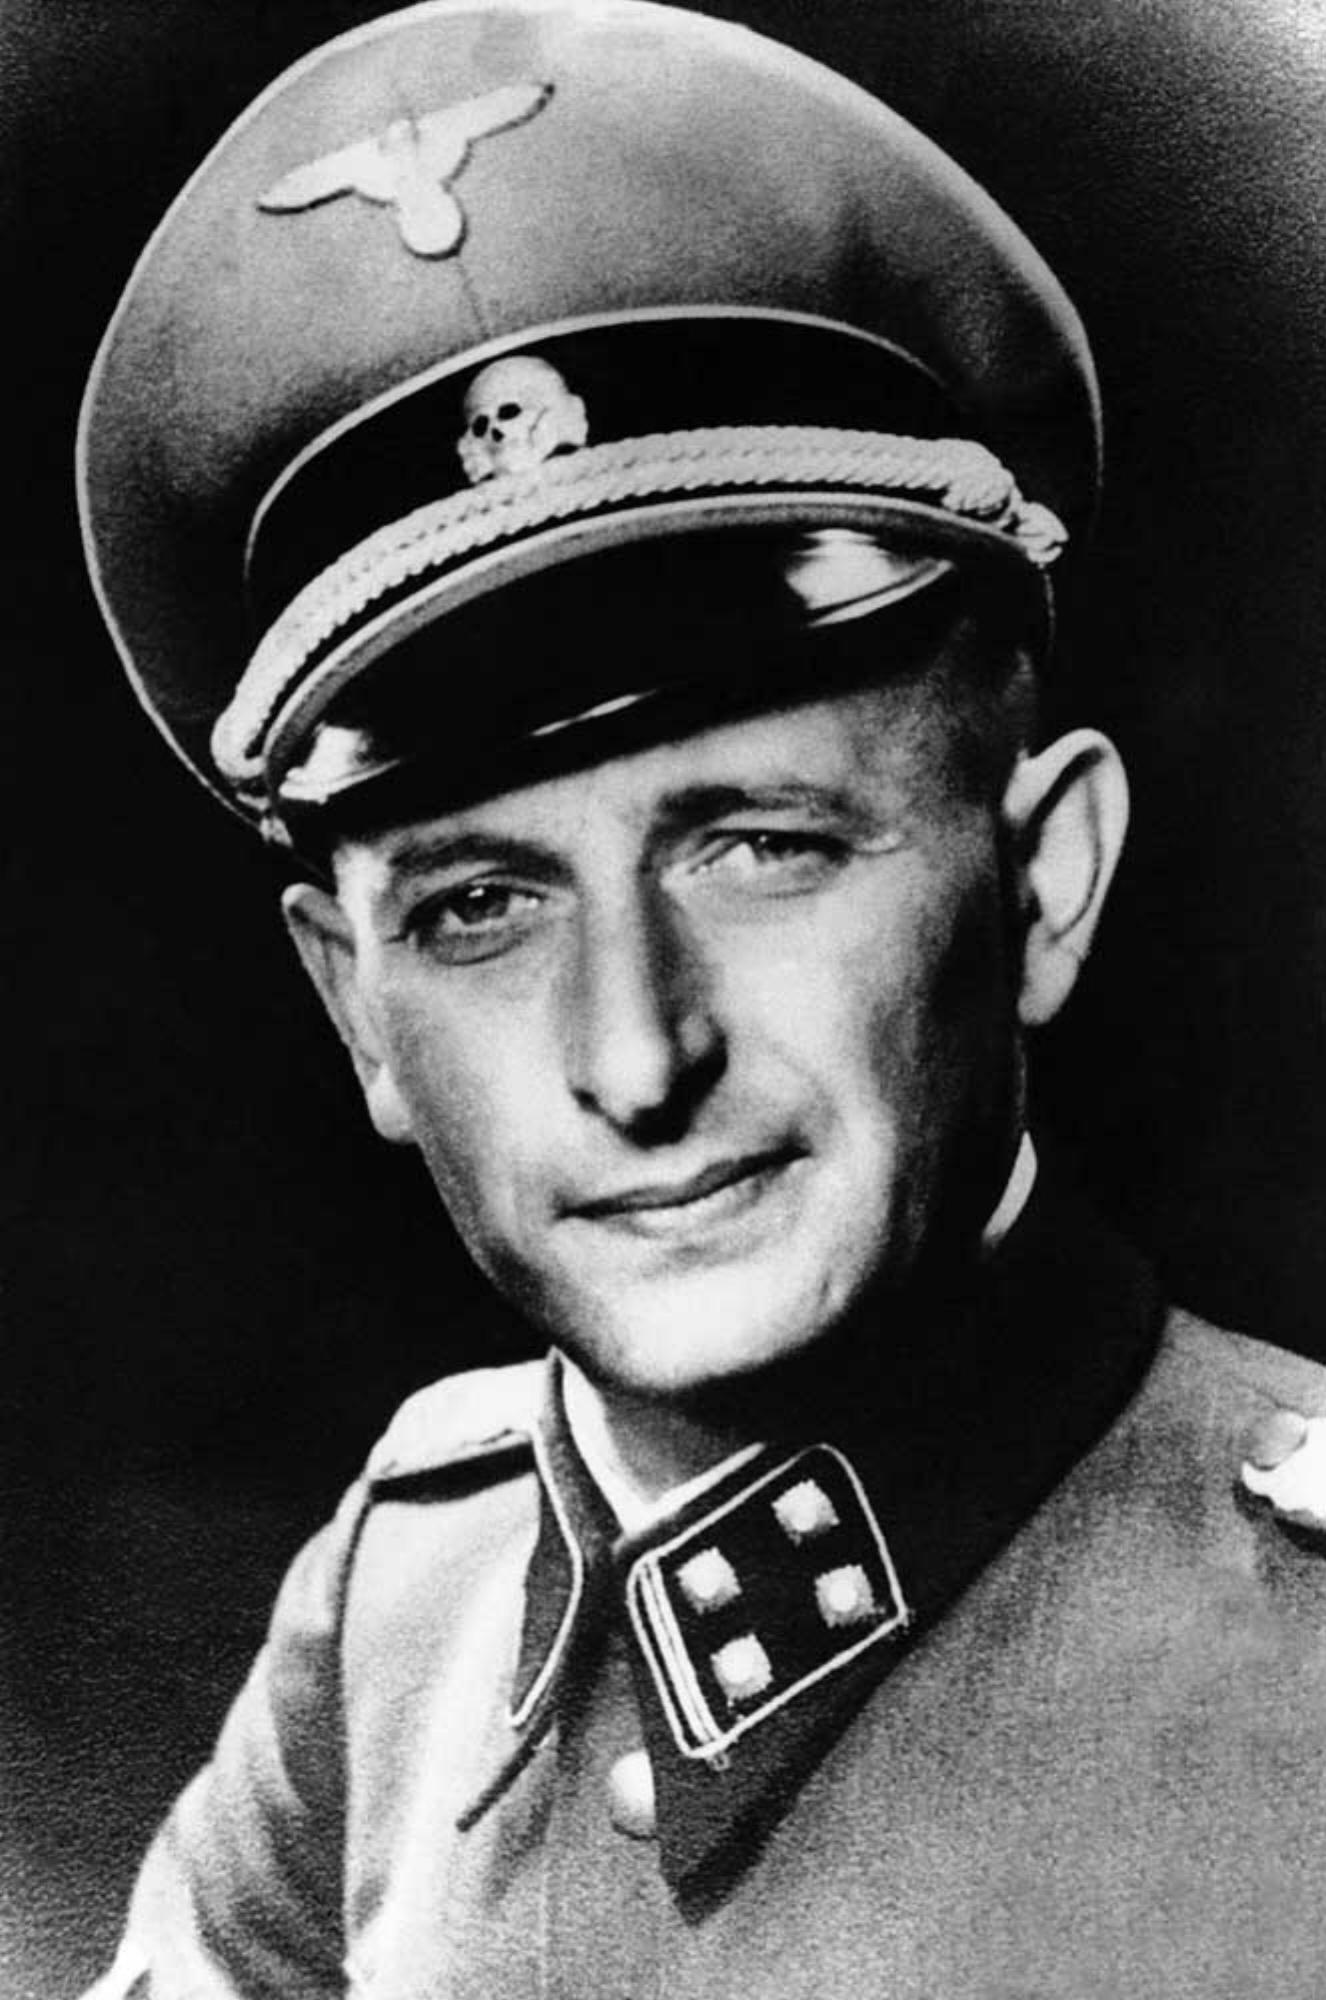 Adolf Eichmann: biography and crimes 42